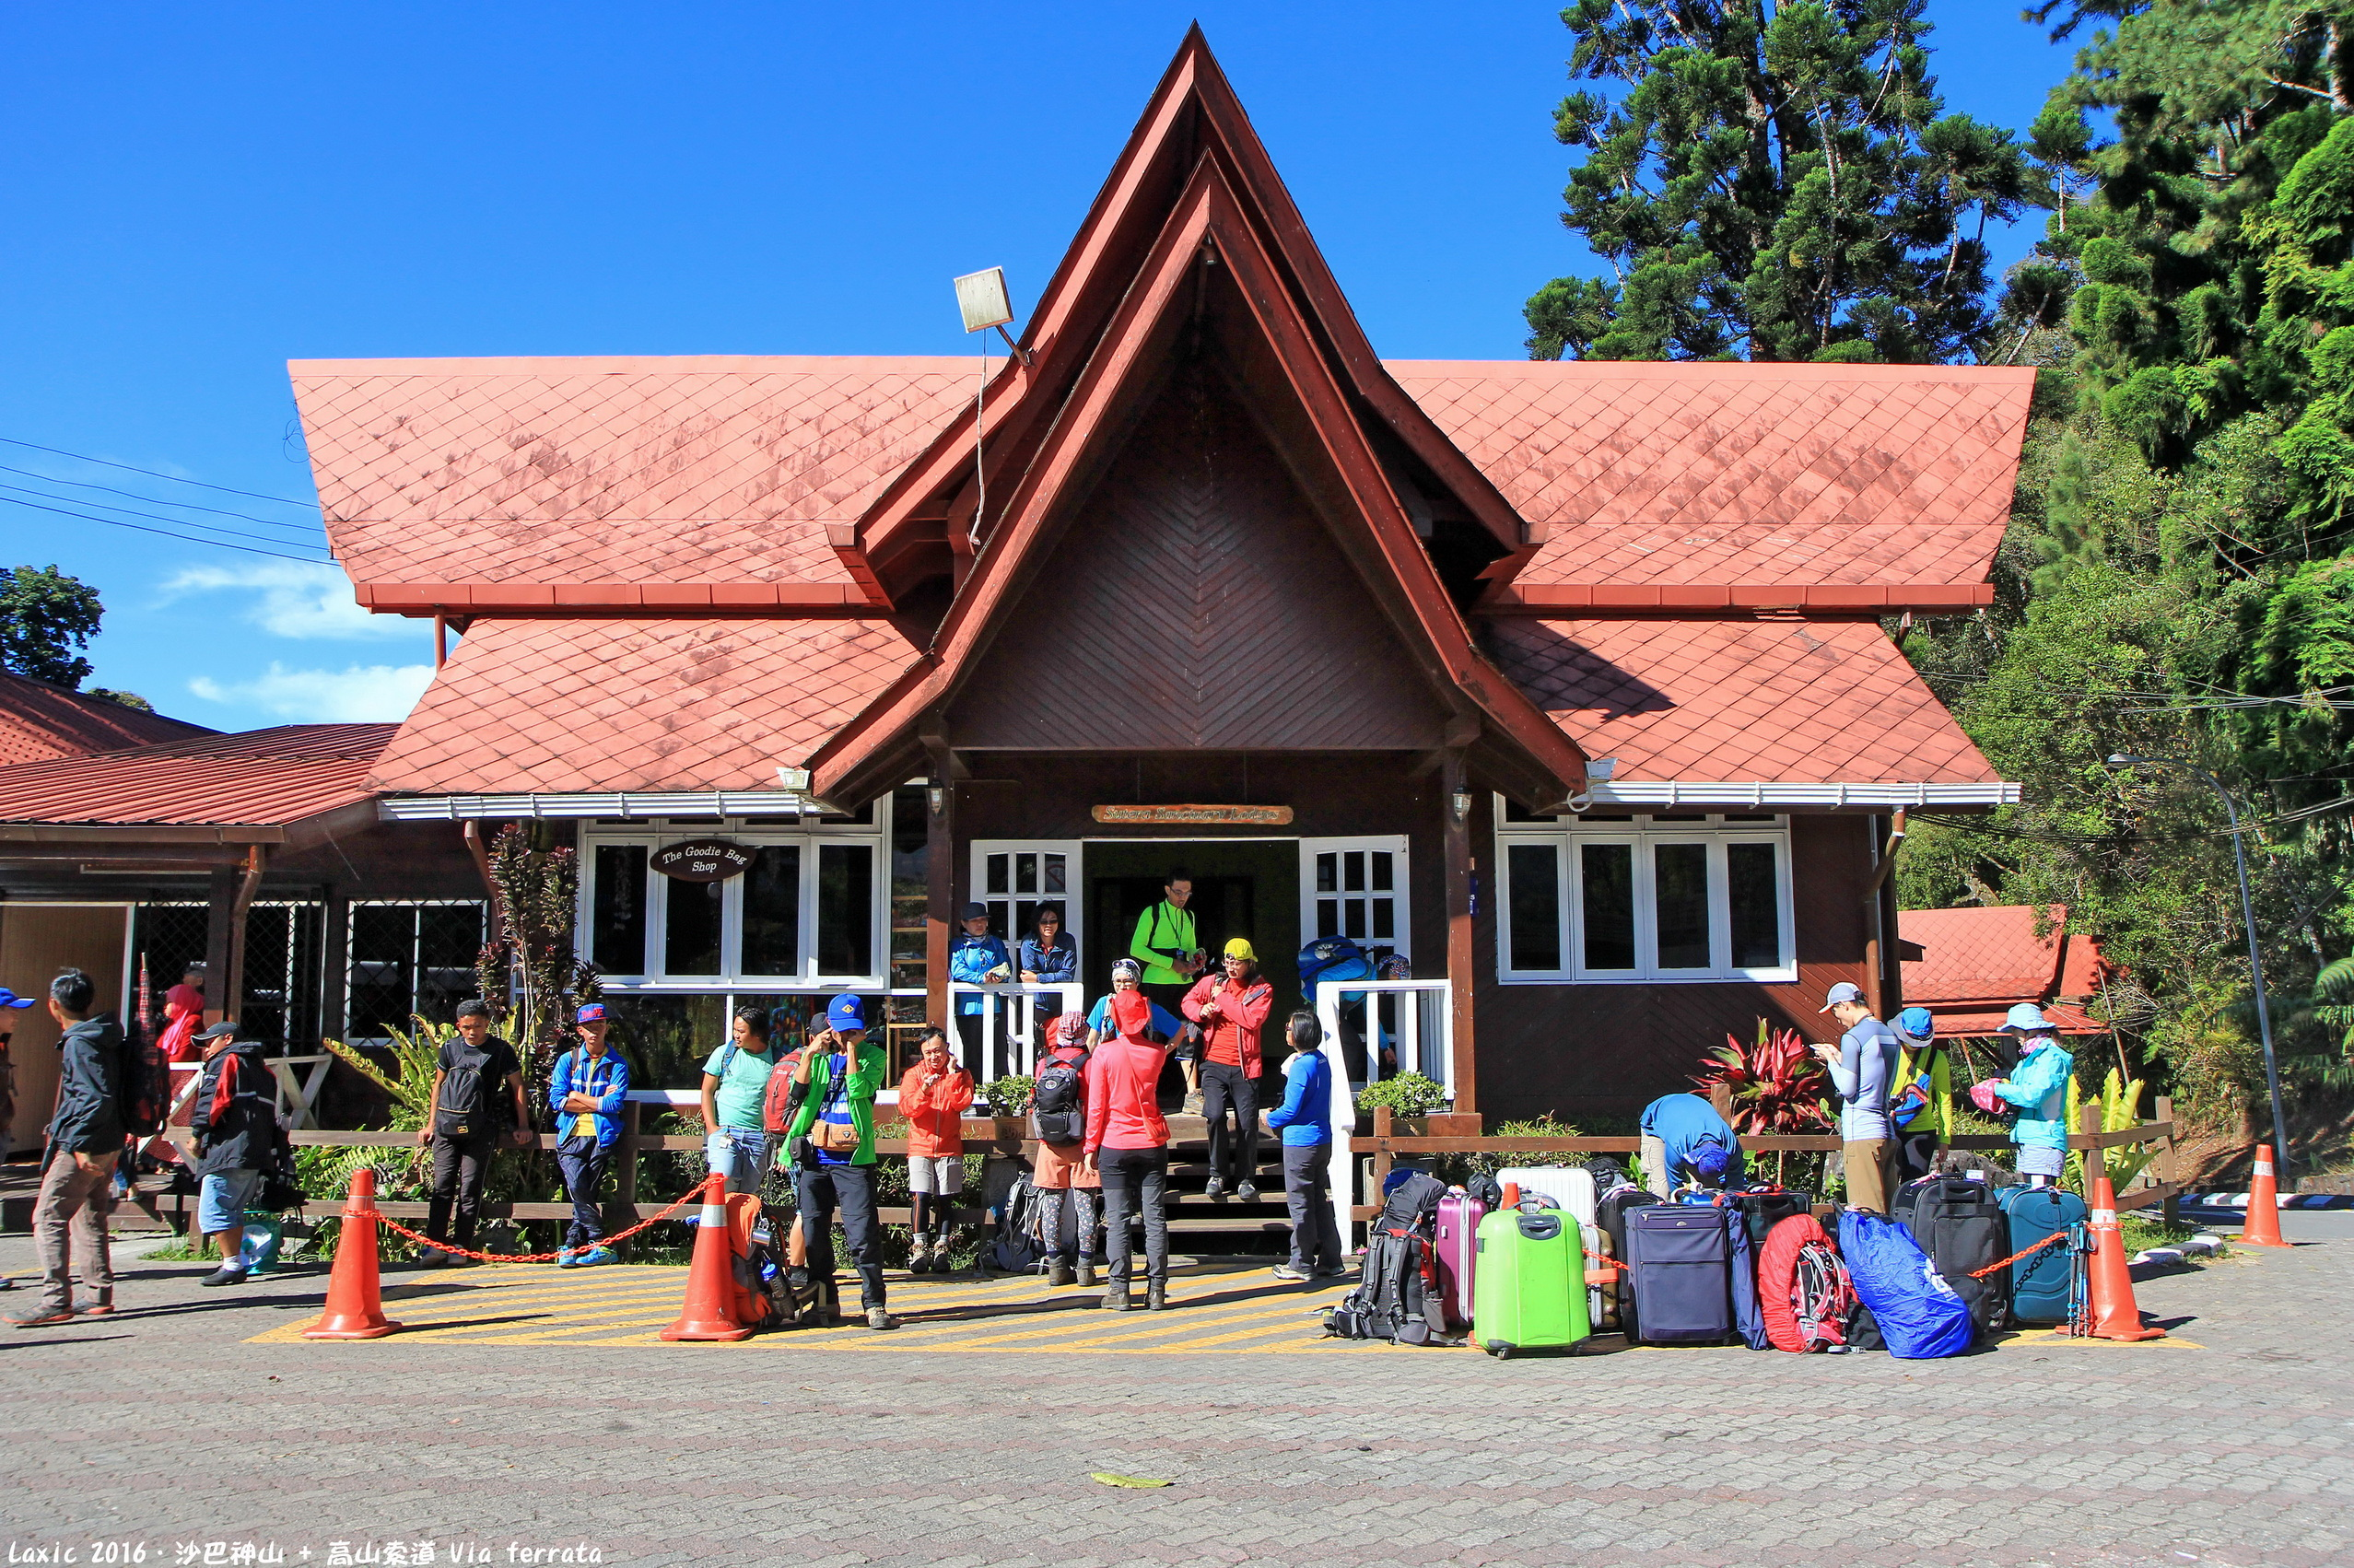 Laxic 2016.馬來西亞沙巴神山 + 高山索道 Via ferrata (Mountain Torq)